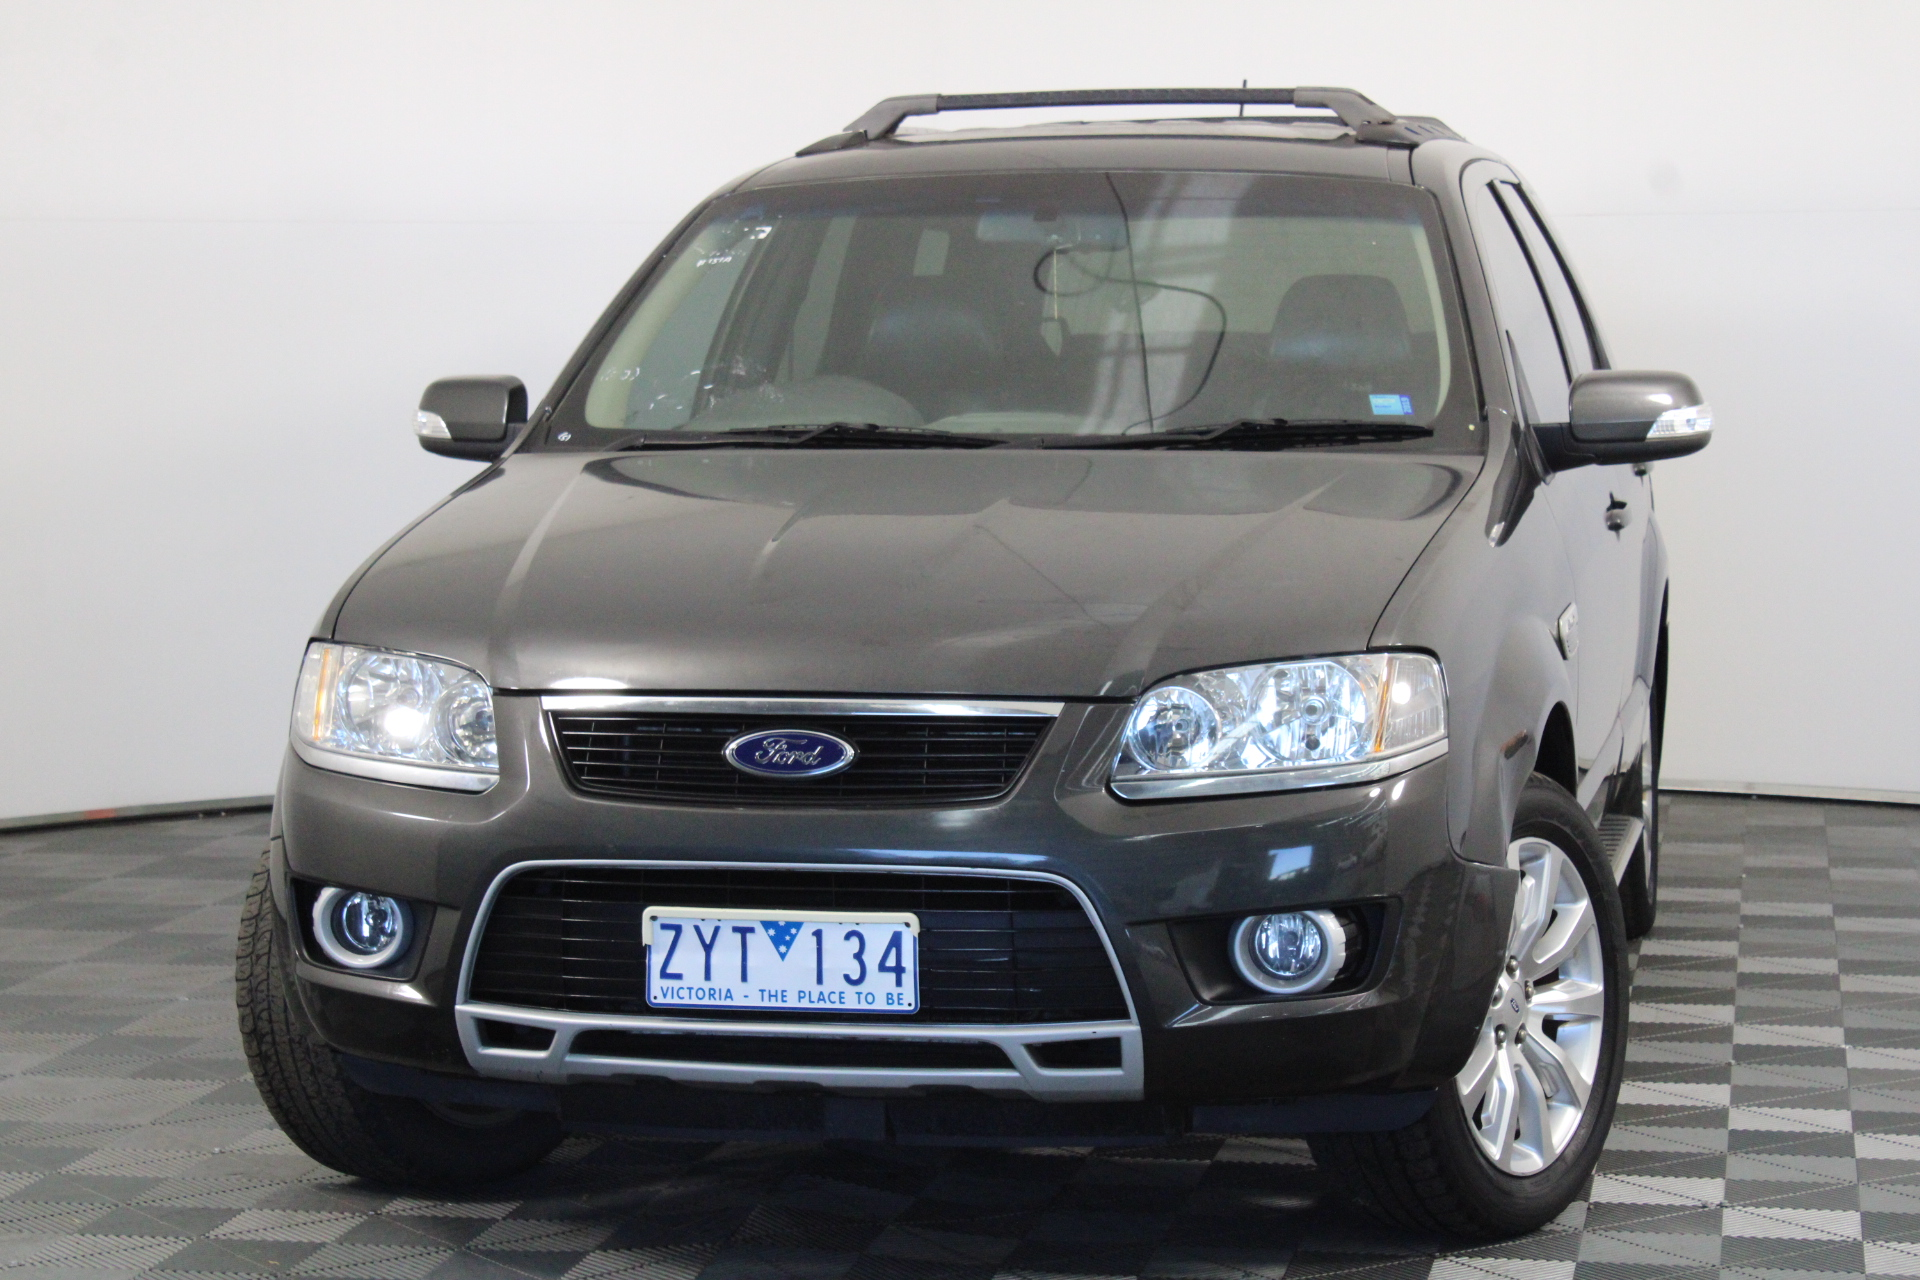 2009 Ford Territory Ghia SY II Automatic 7 Seats Wagon